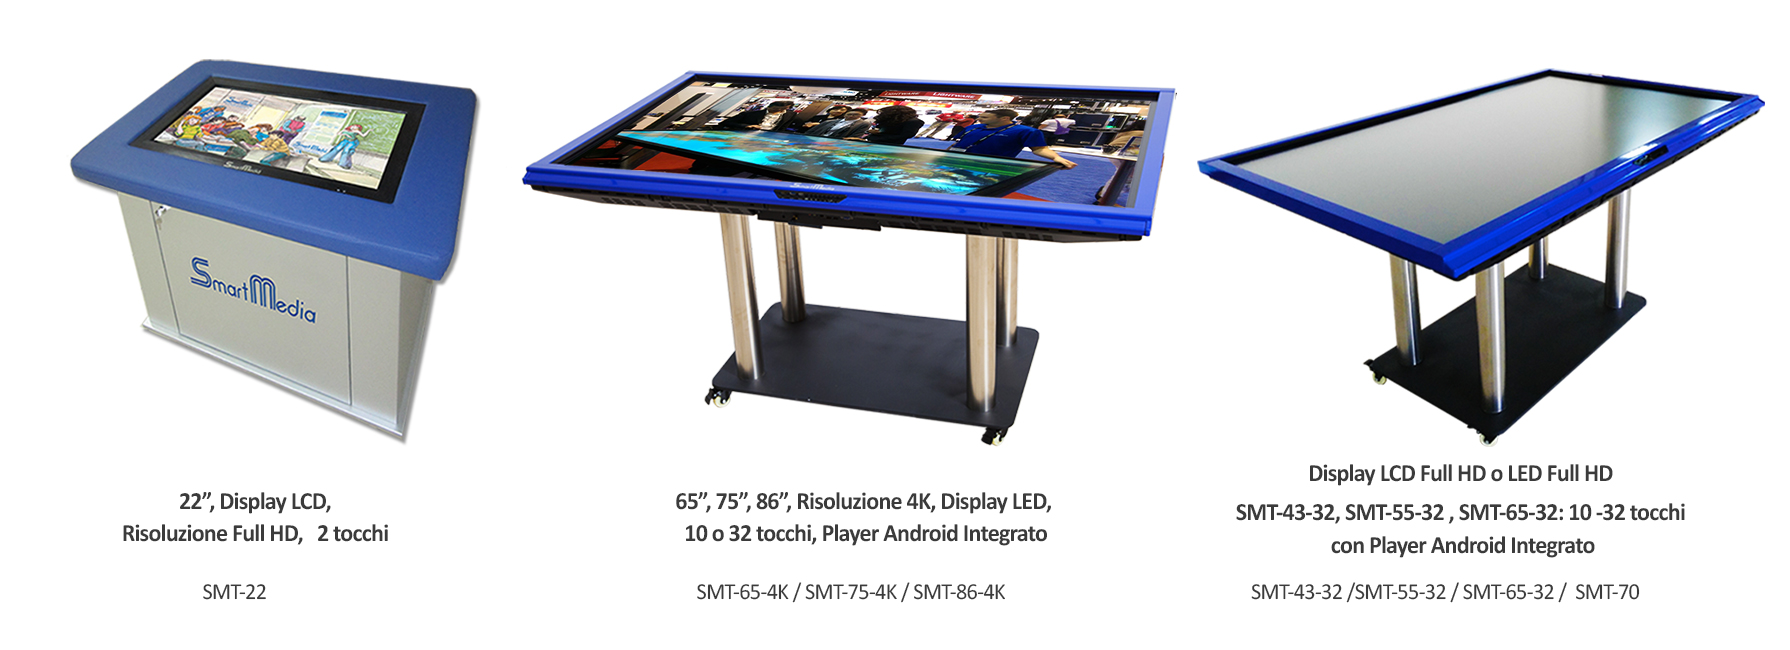 Tavoli interattivi multimediali smartmedia tecnologia multi touch smartmedia srl - Tavolo touch screen ...